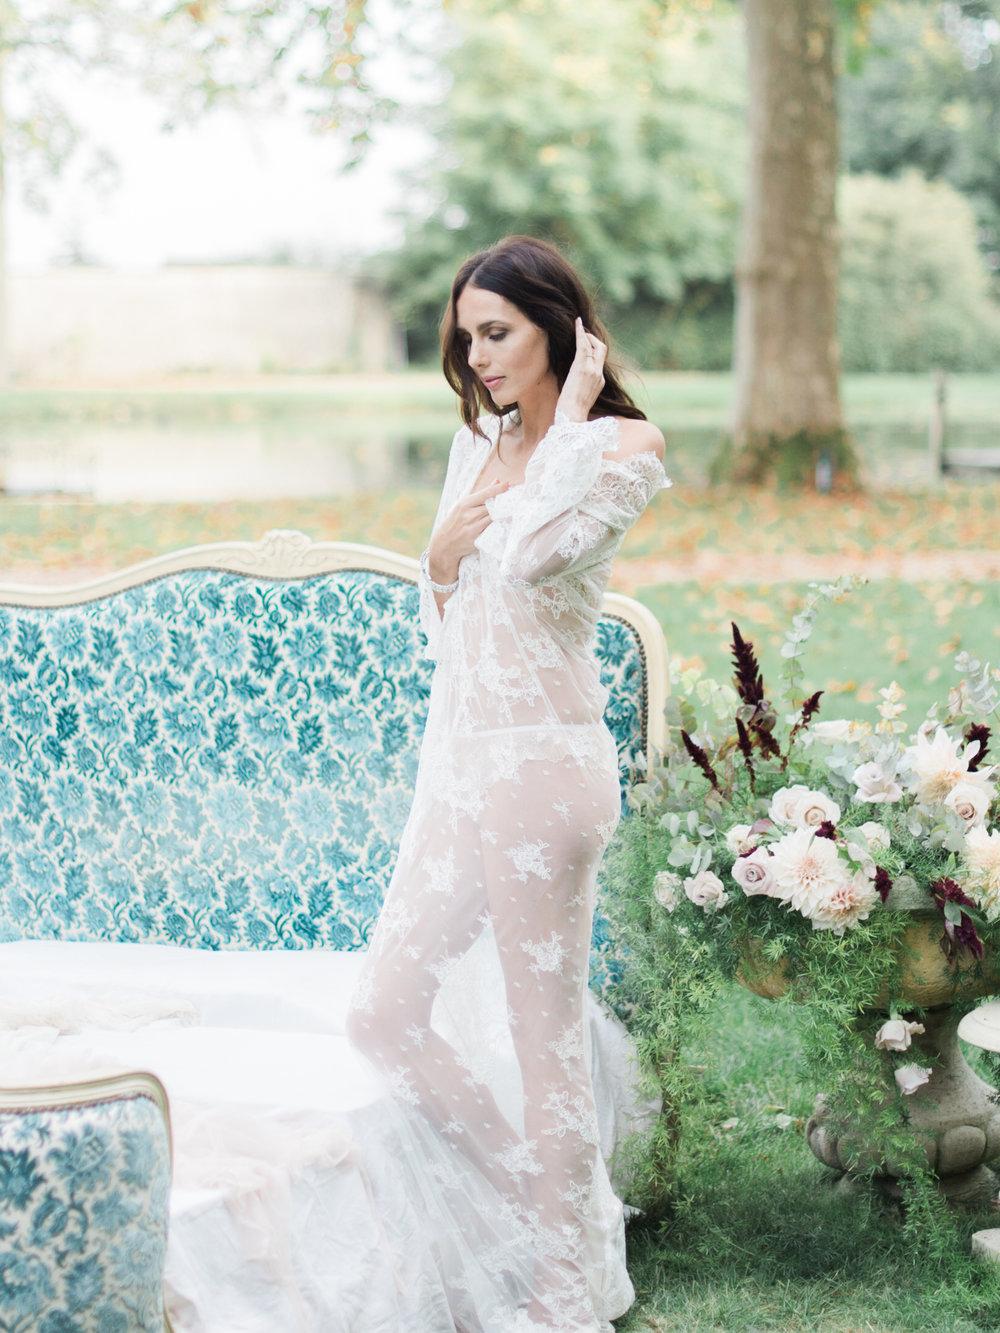 JacquelineAnnePhotography-Boudoir-Outdoors-15.jpg